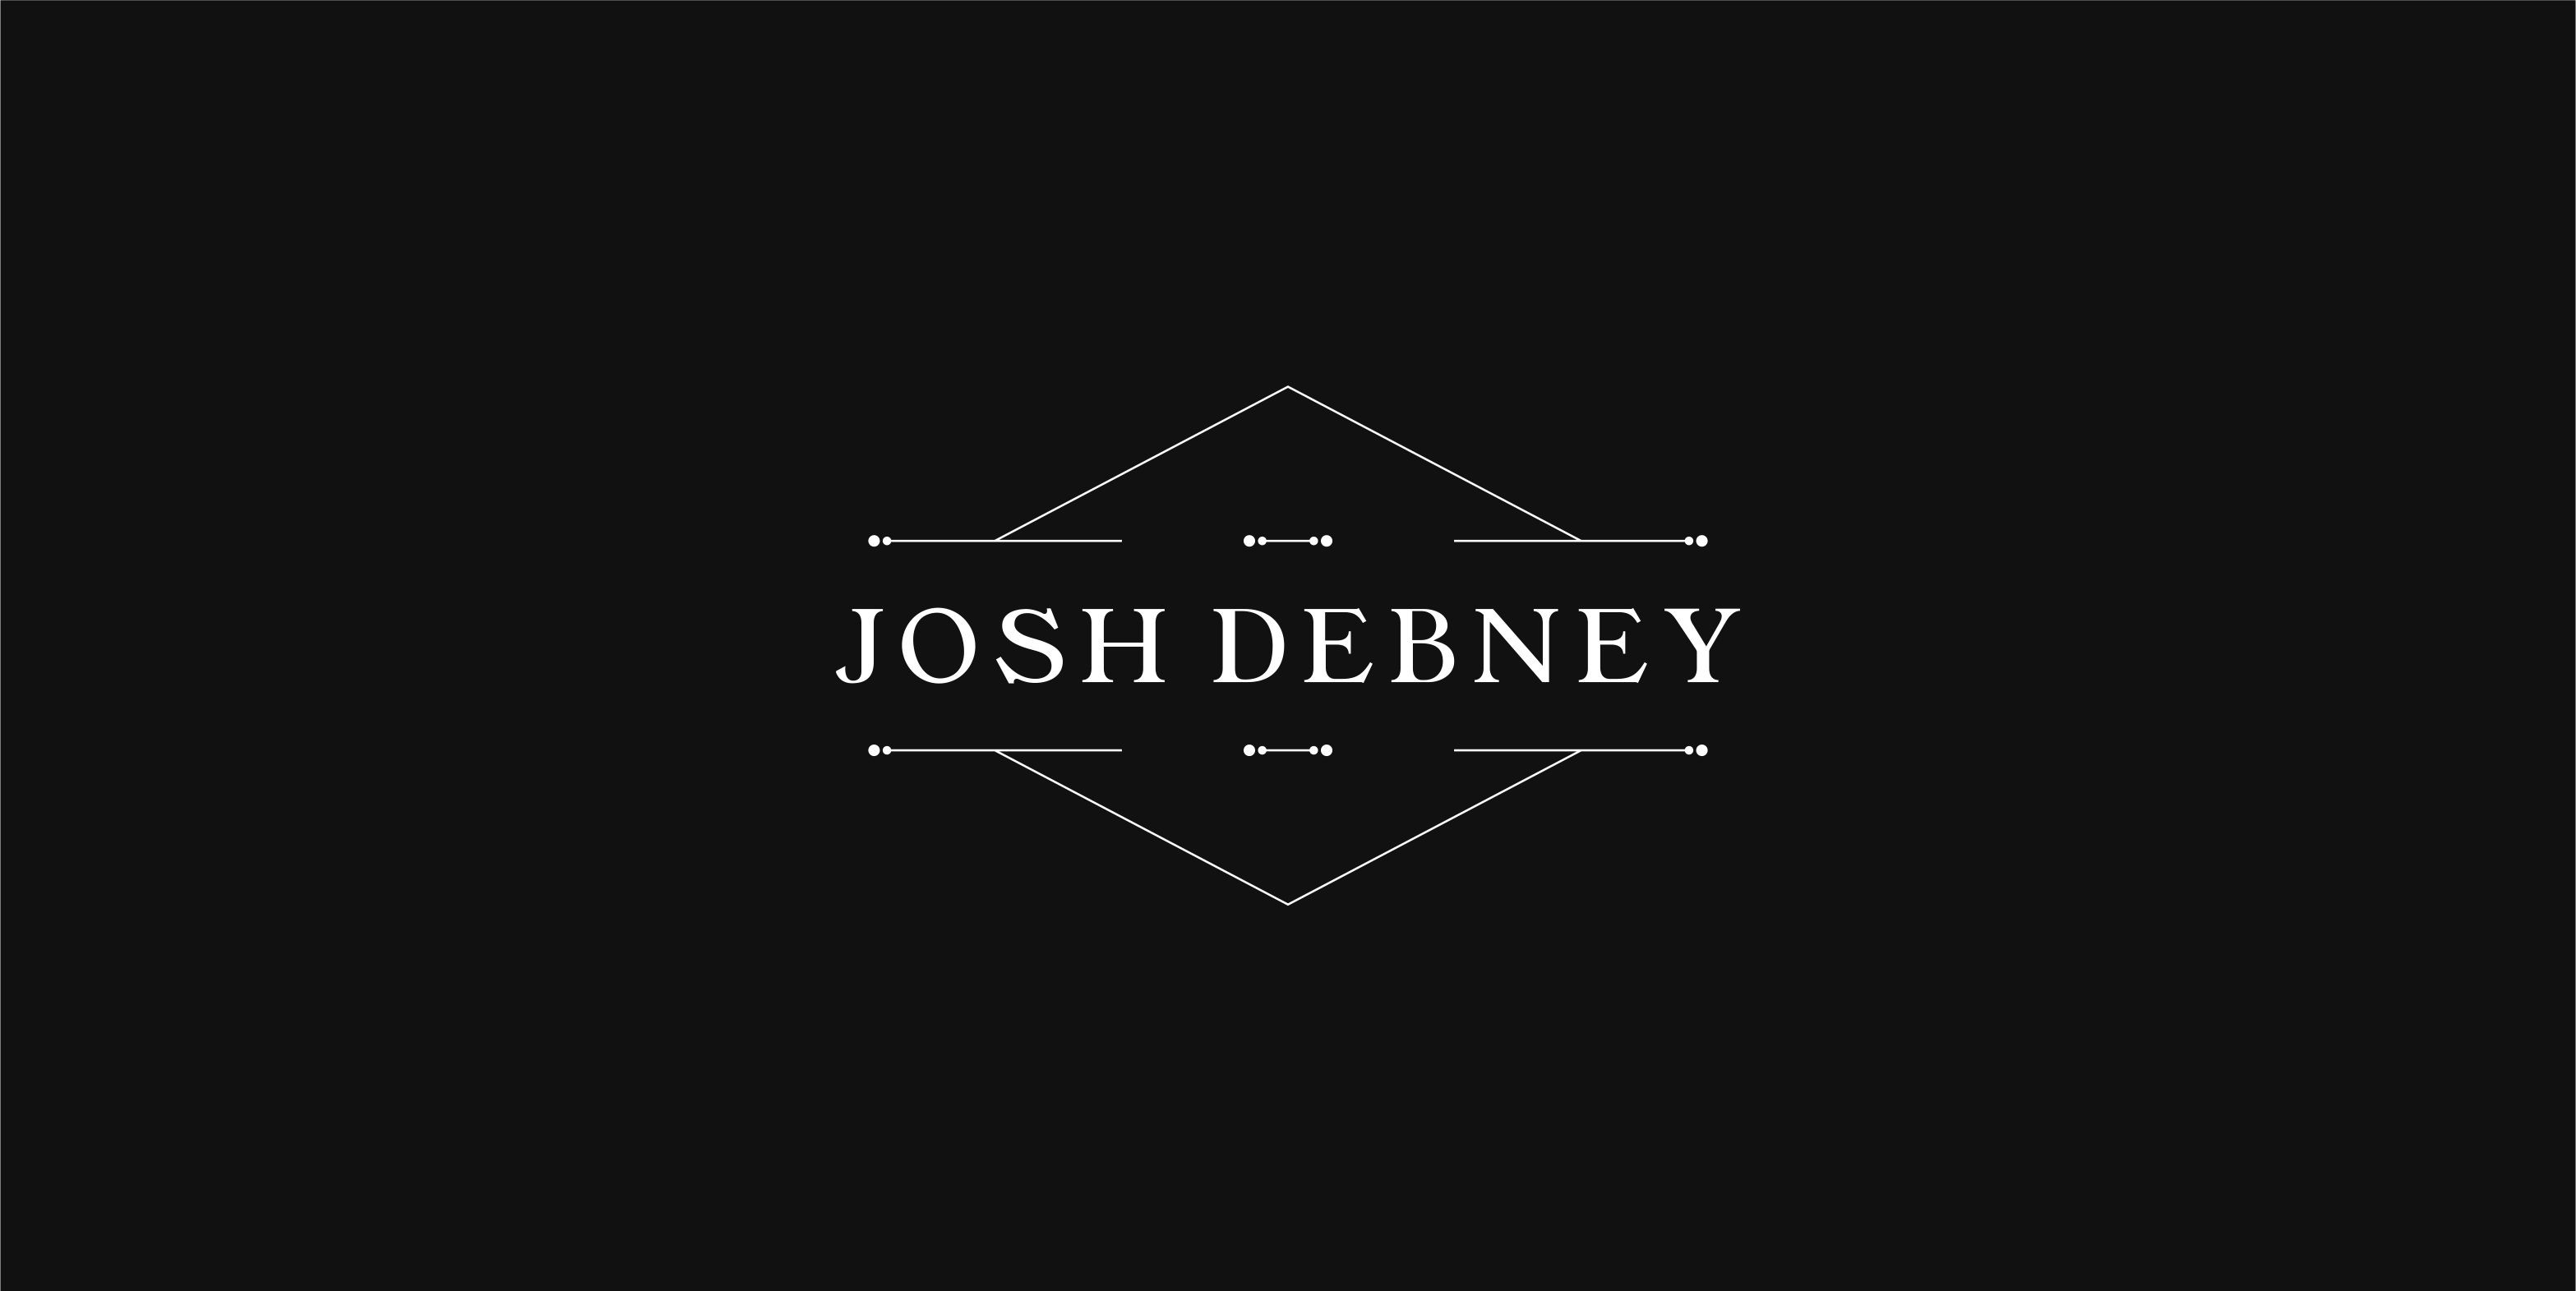 Create an awesome logo design for a film/tv composer!